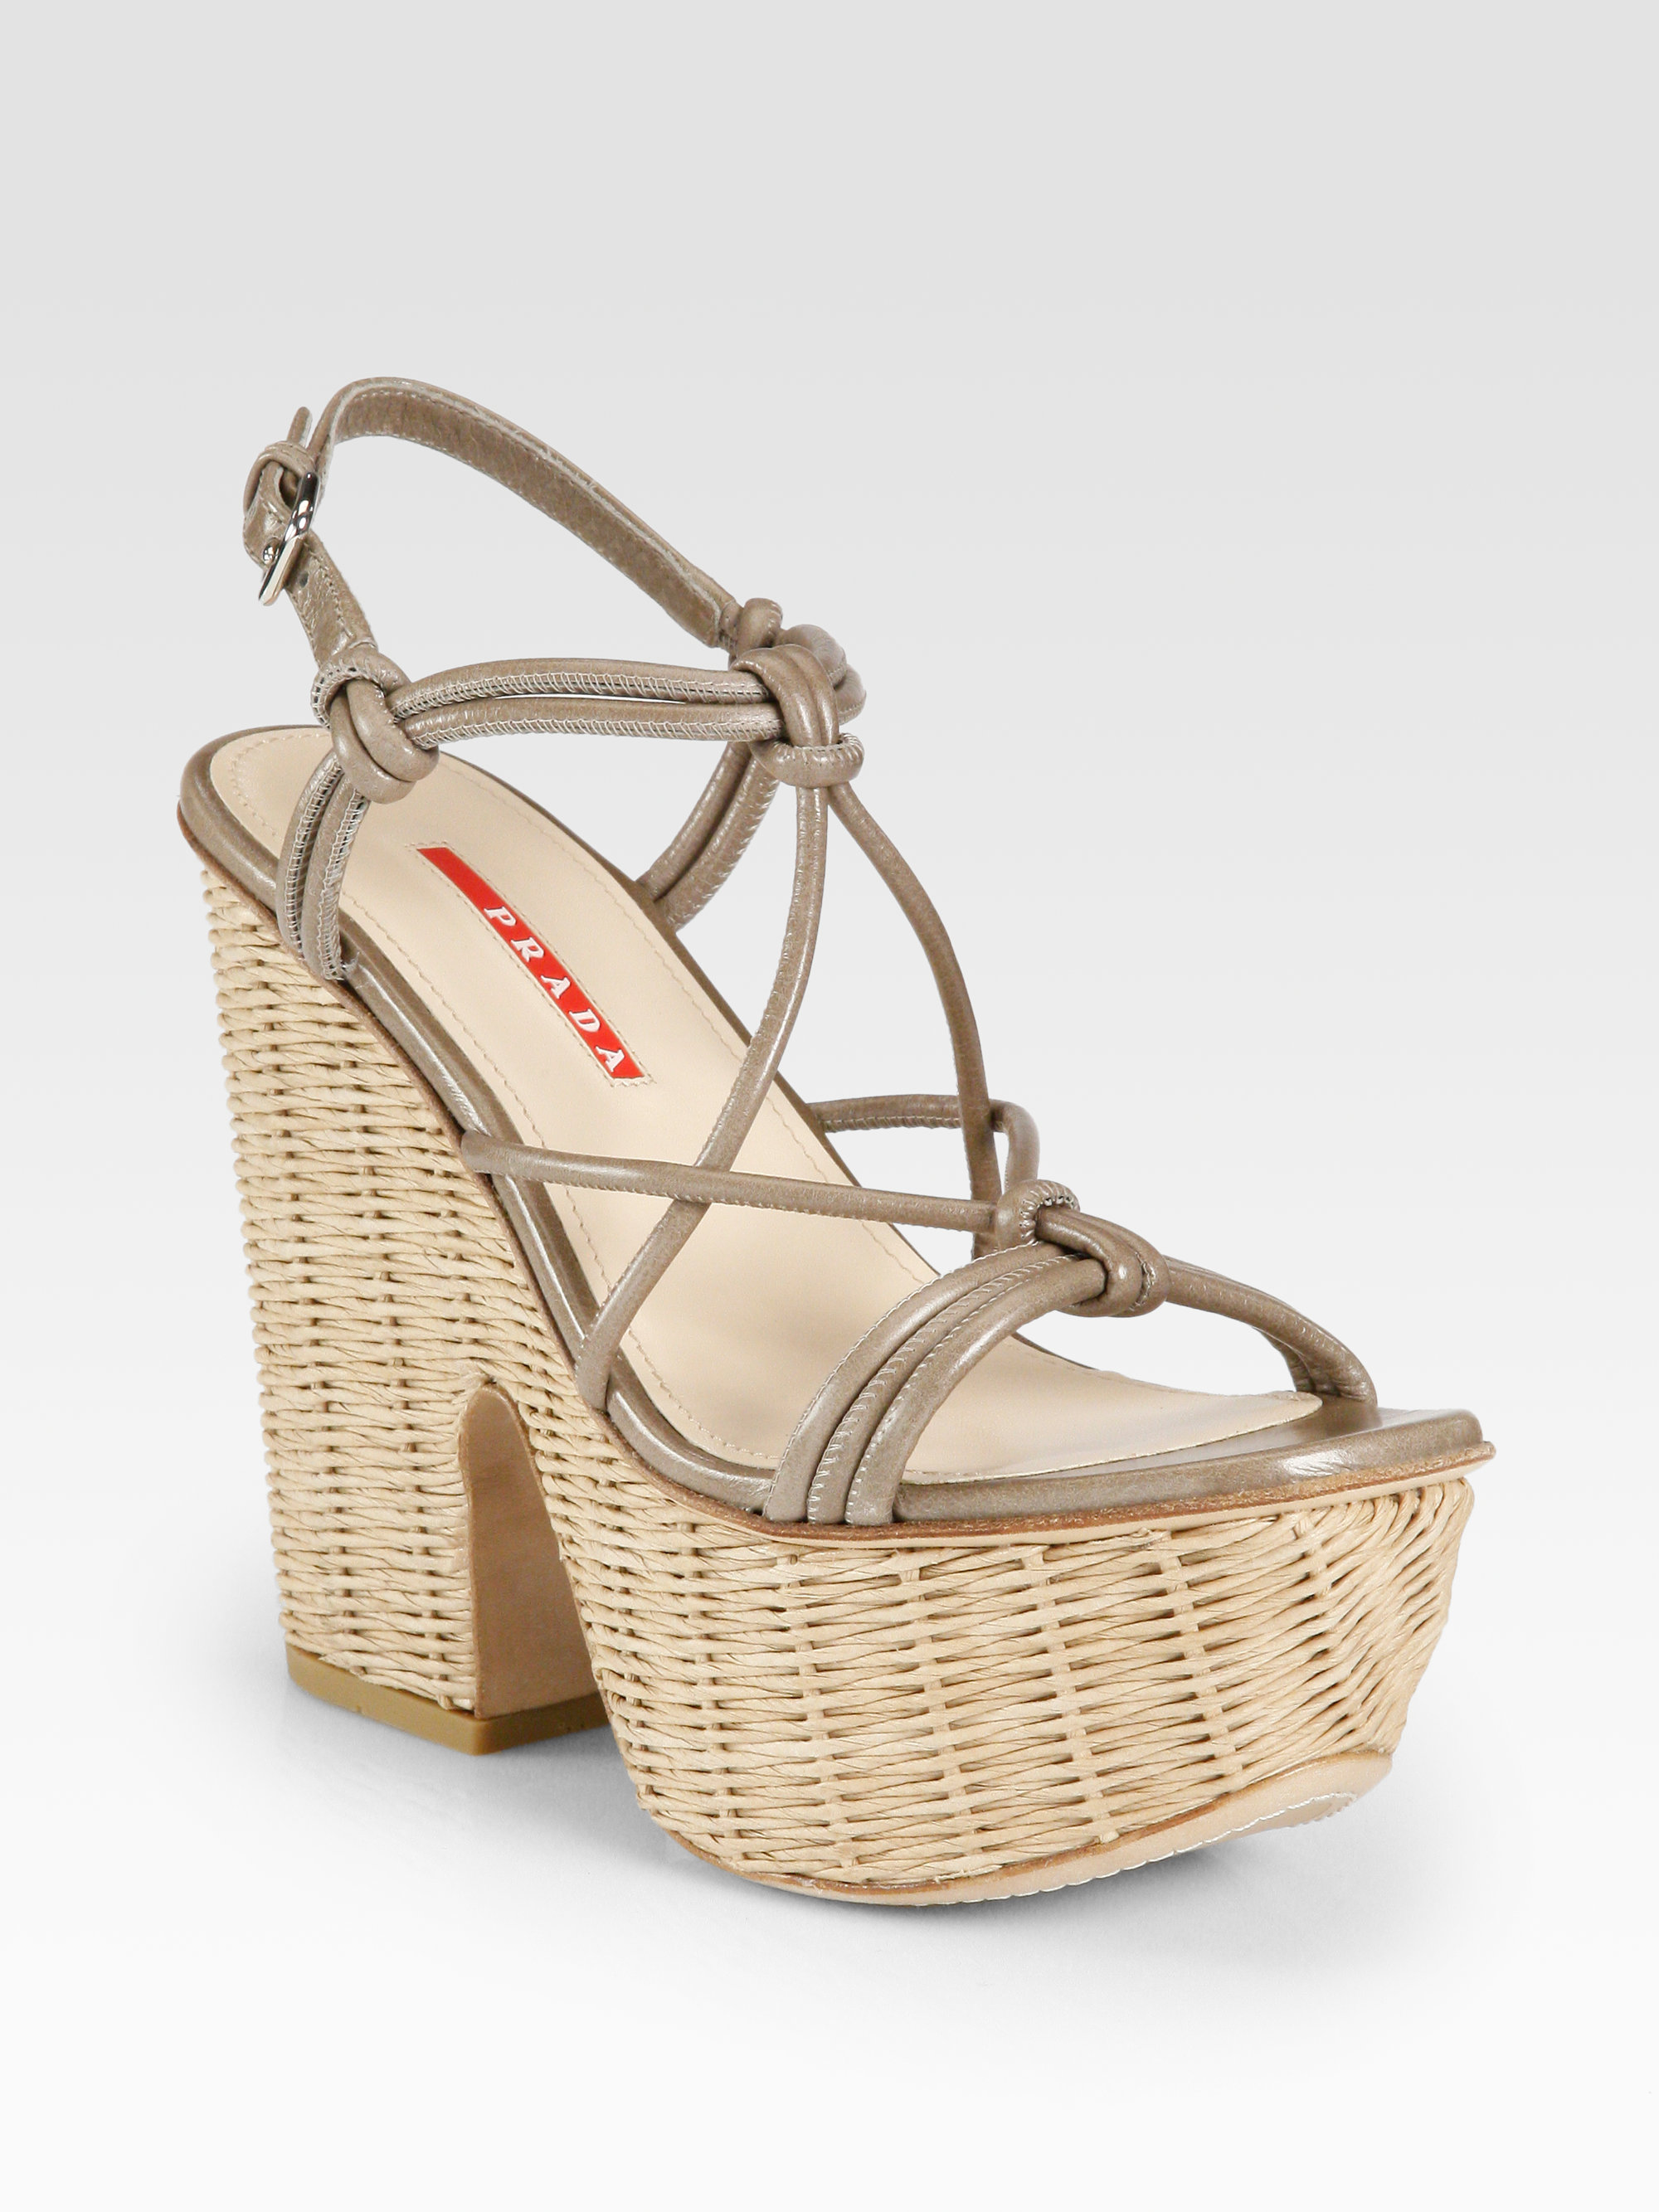 Lyst Prada Leather Raffia Platform Sandals In Gray